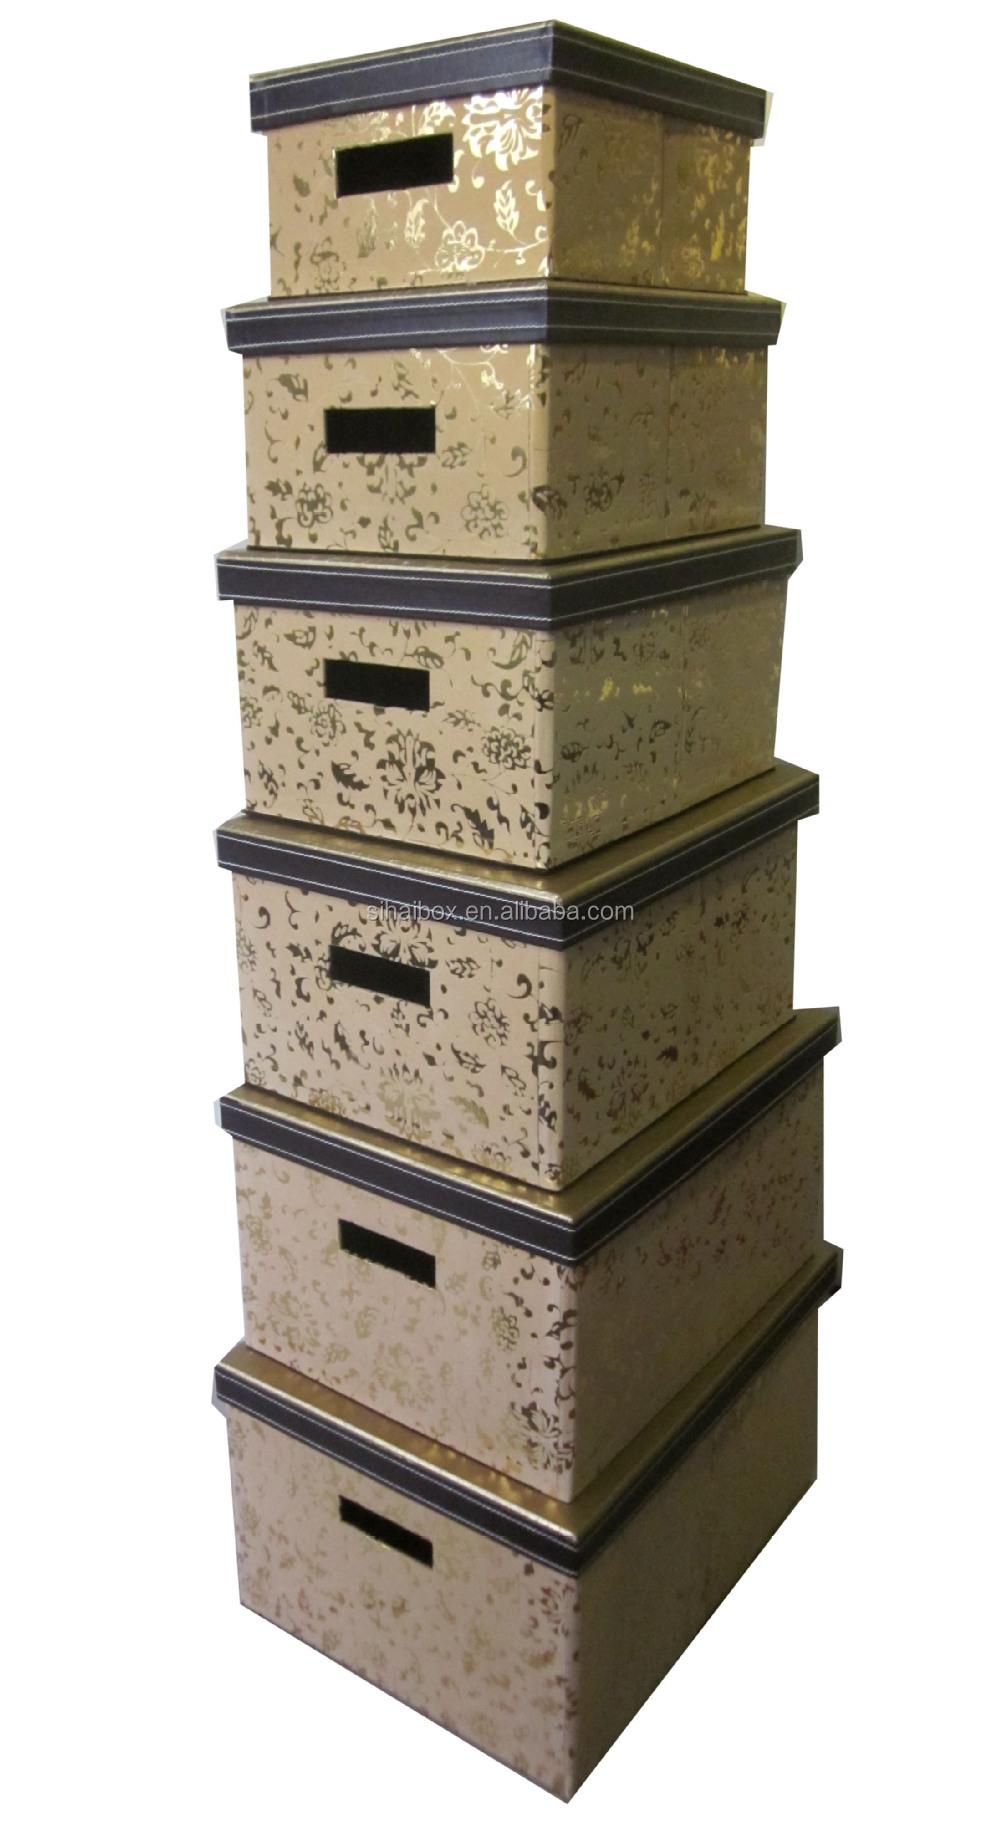 Decorative Boxes In Bulk : Wholesale foldalbe decorative cardboard fabric storage